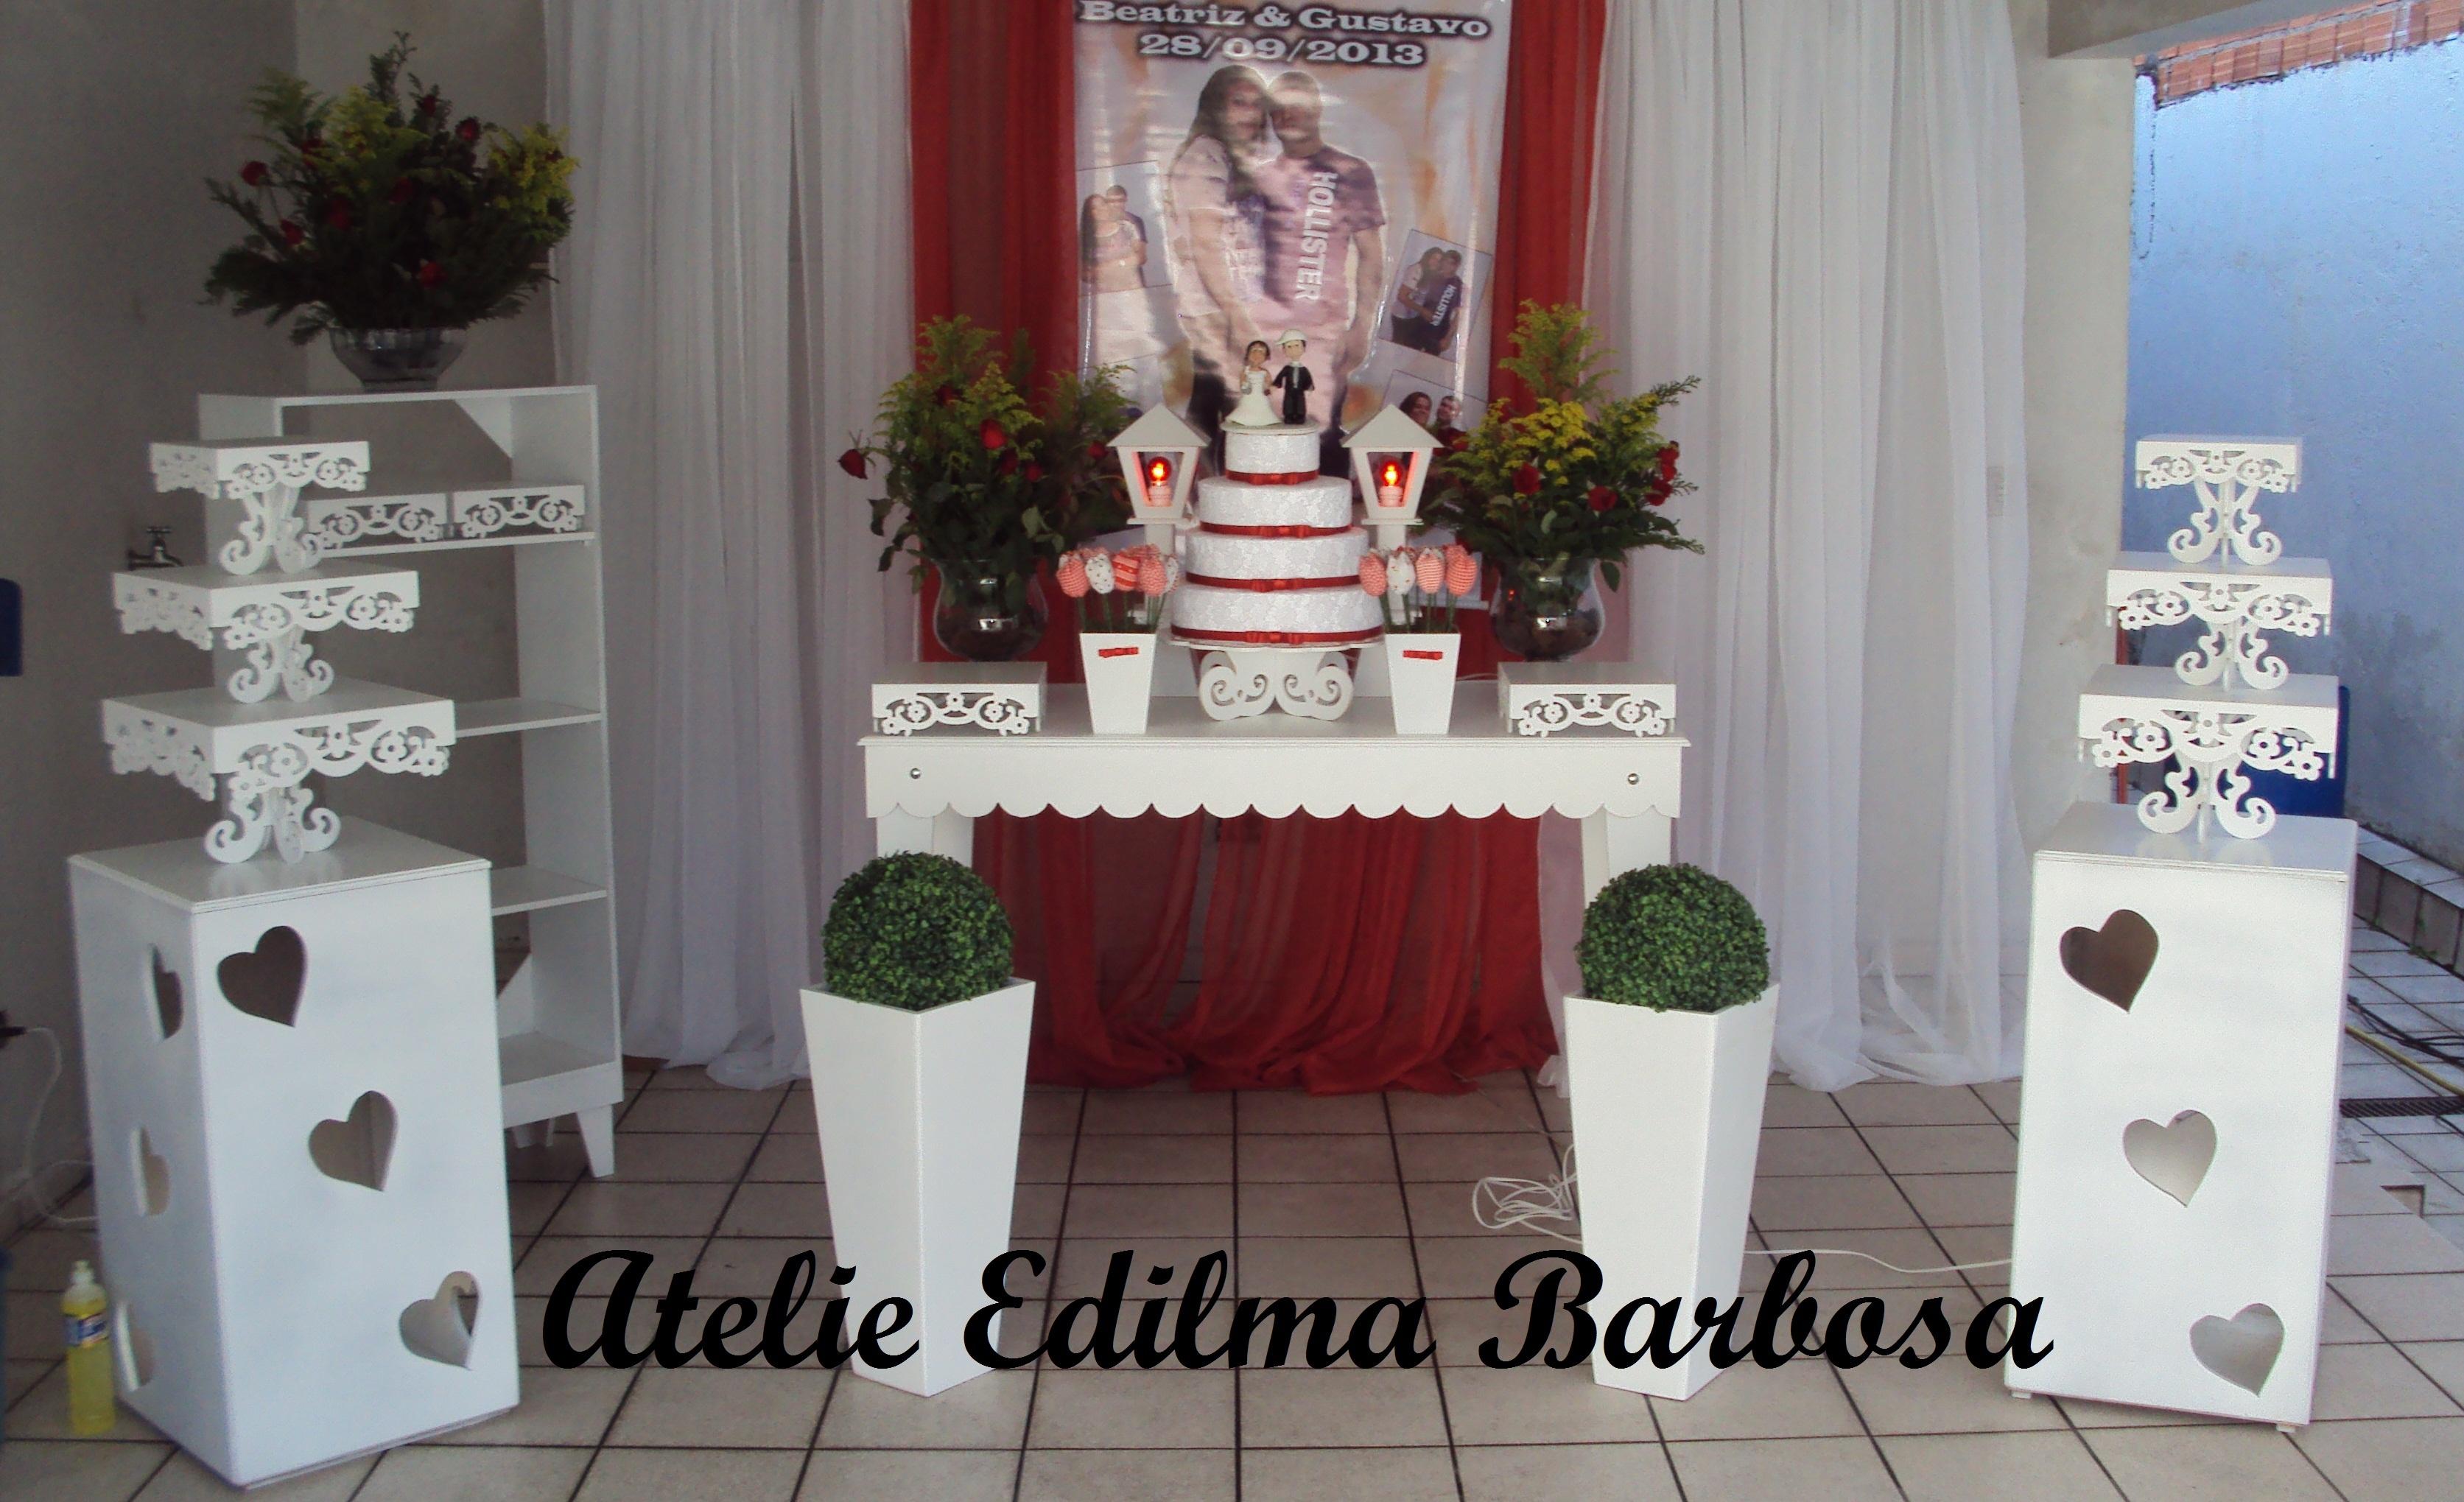 ... casamento mesa provencal mesa provencal casamento casamento vermelho e